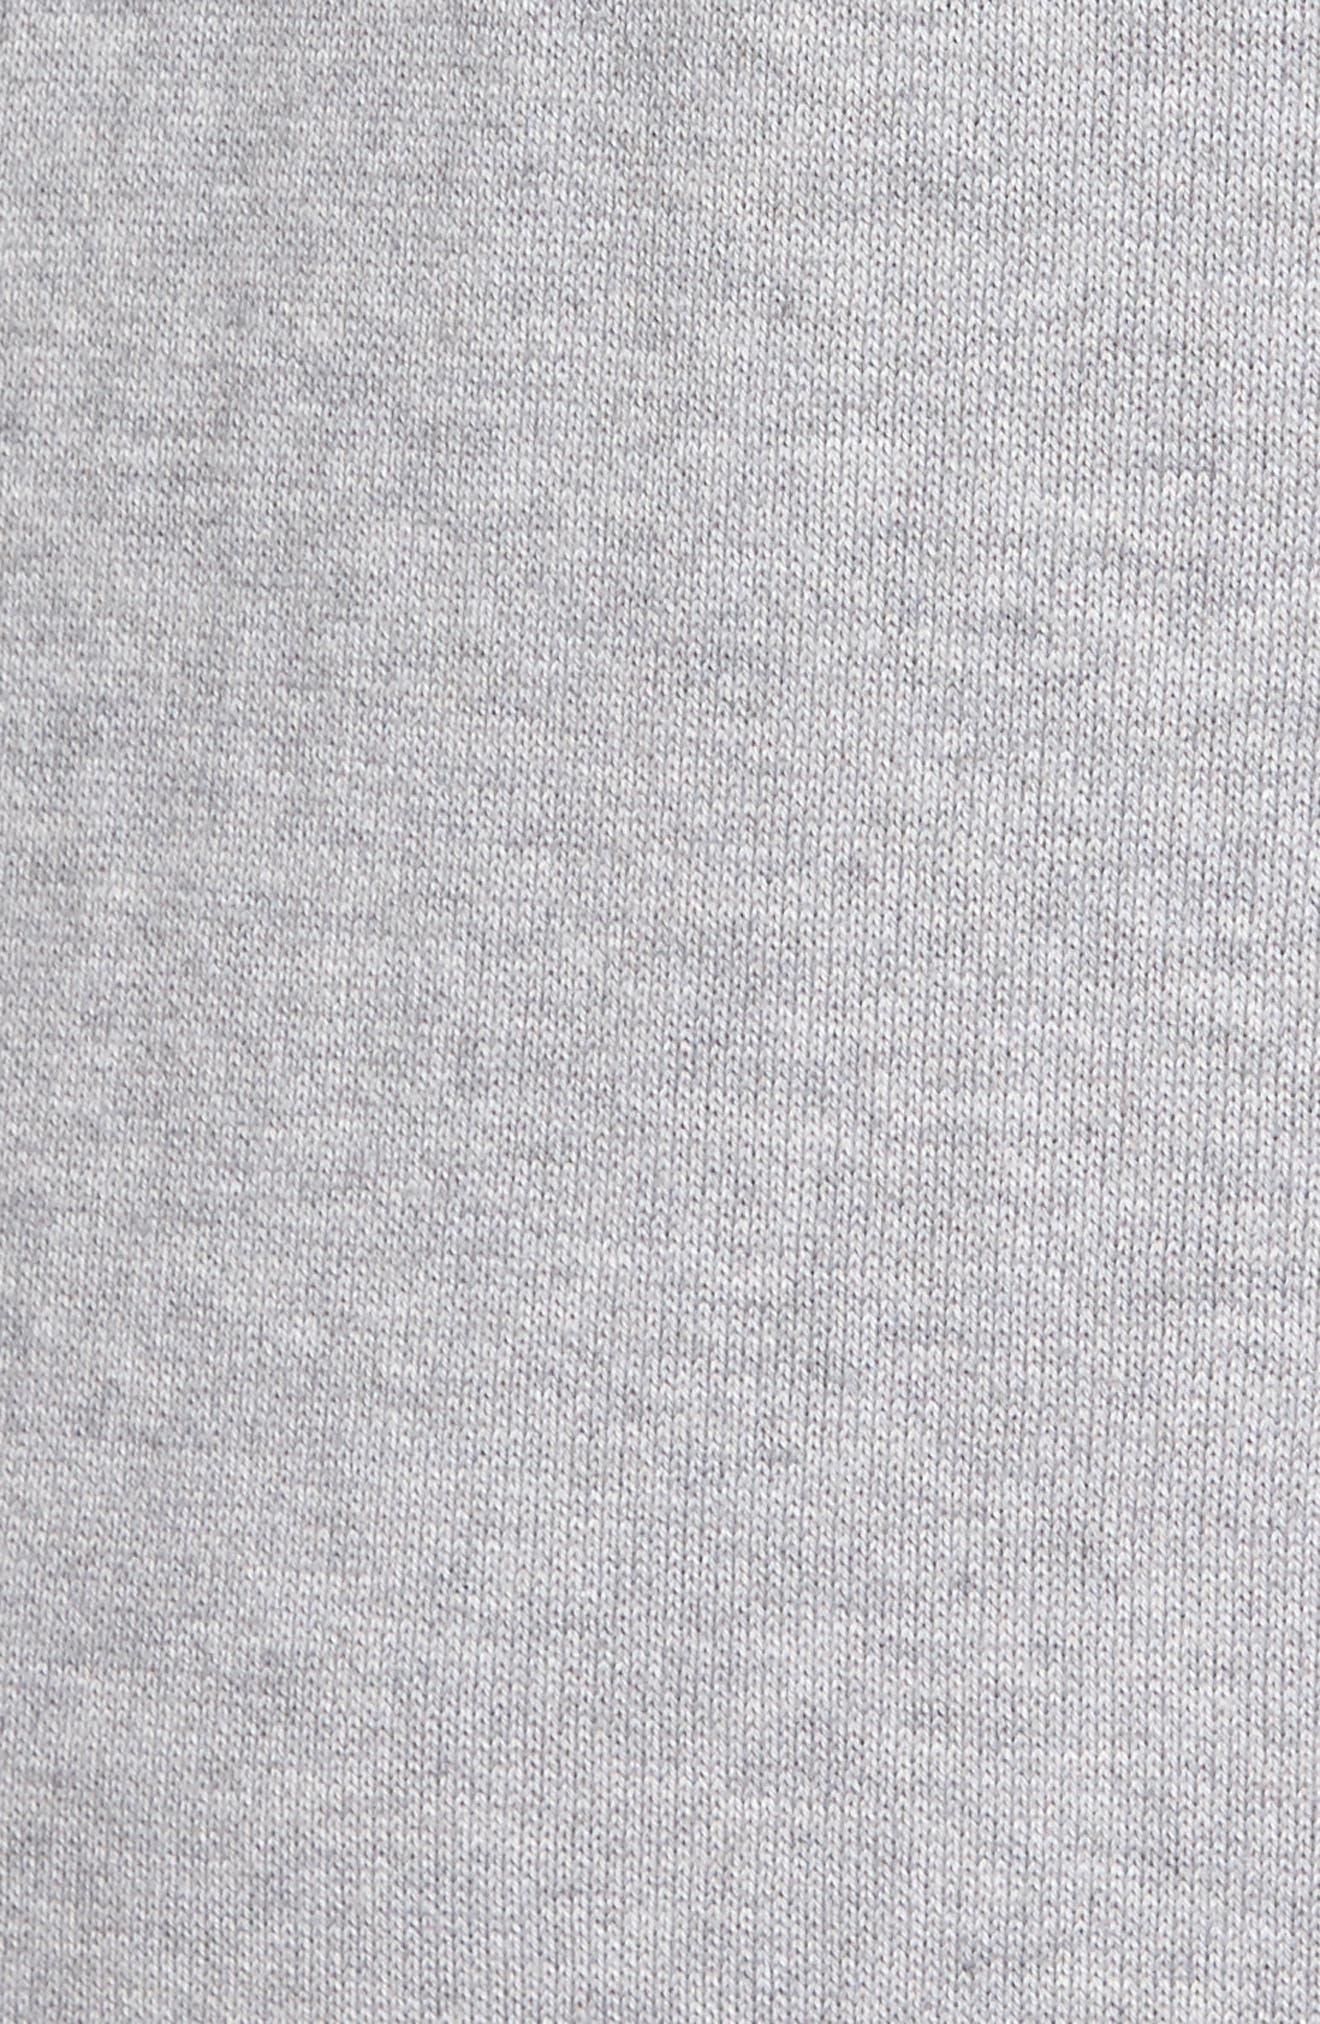 R18 Chopper Rib Detail Sweater,                             Alternate thumbnail 5, color,                             078